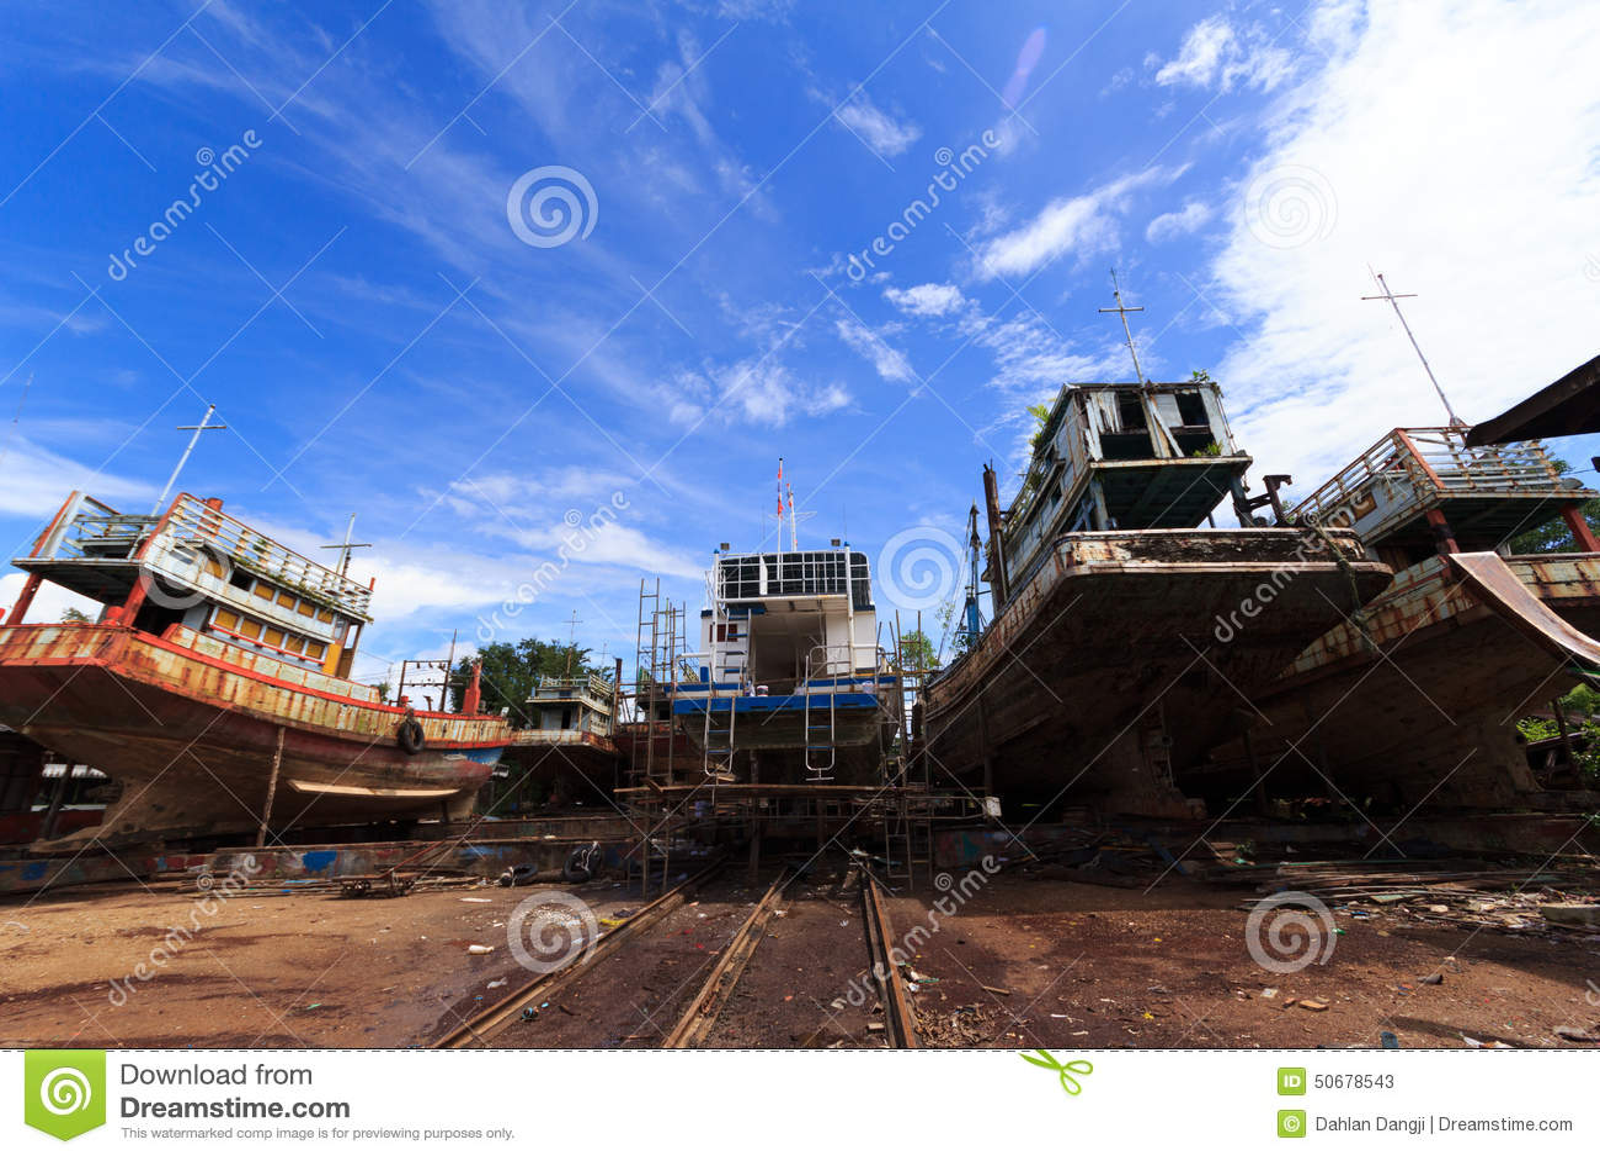 Download 渔船船坞 库存图片. 图片 包括有 码头, 不理智, 横向, 停车库, 铁锈, 海运, 木头, 云彩, 天空 - 50678543